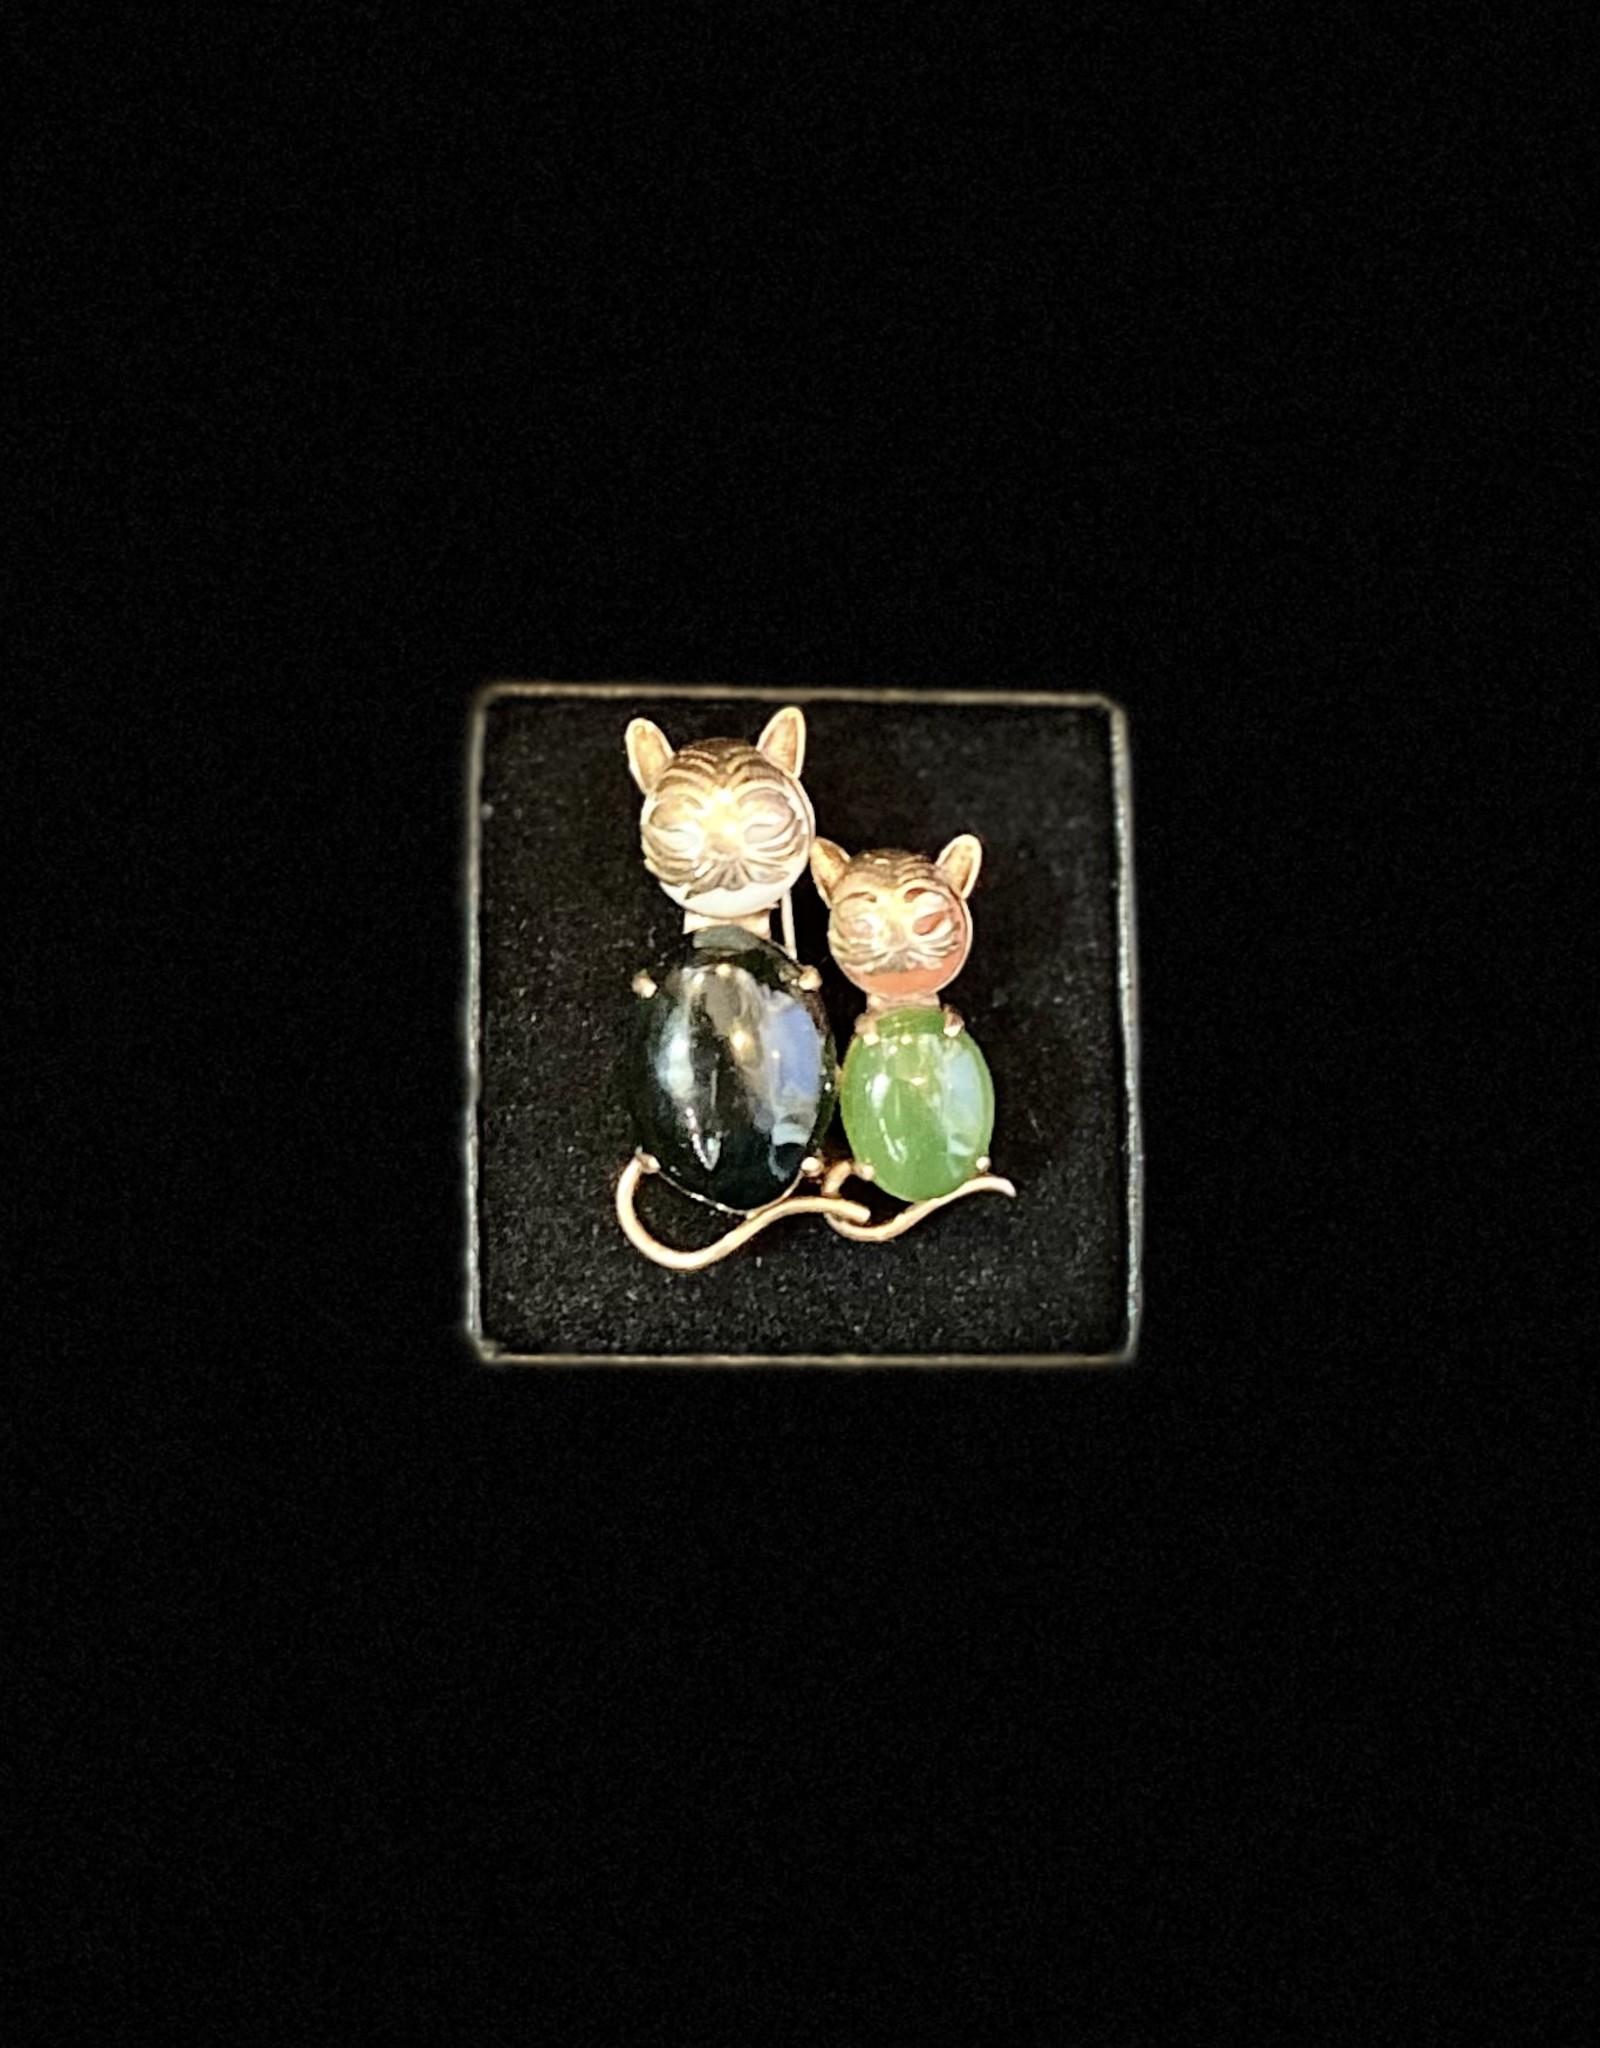 Antique Kitten Broach  14k Agate/Jade/Coral